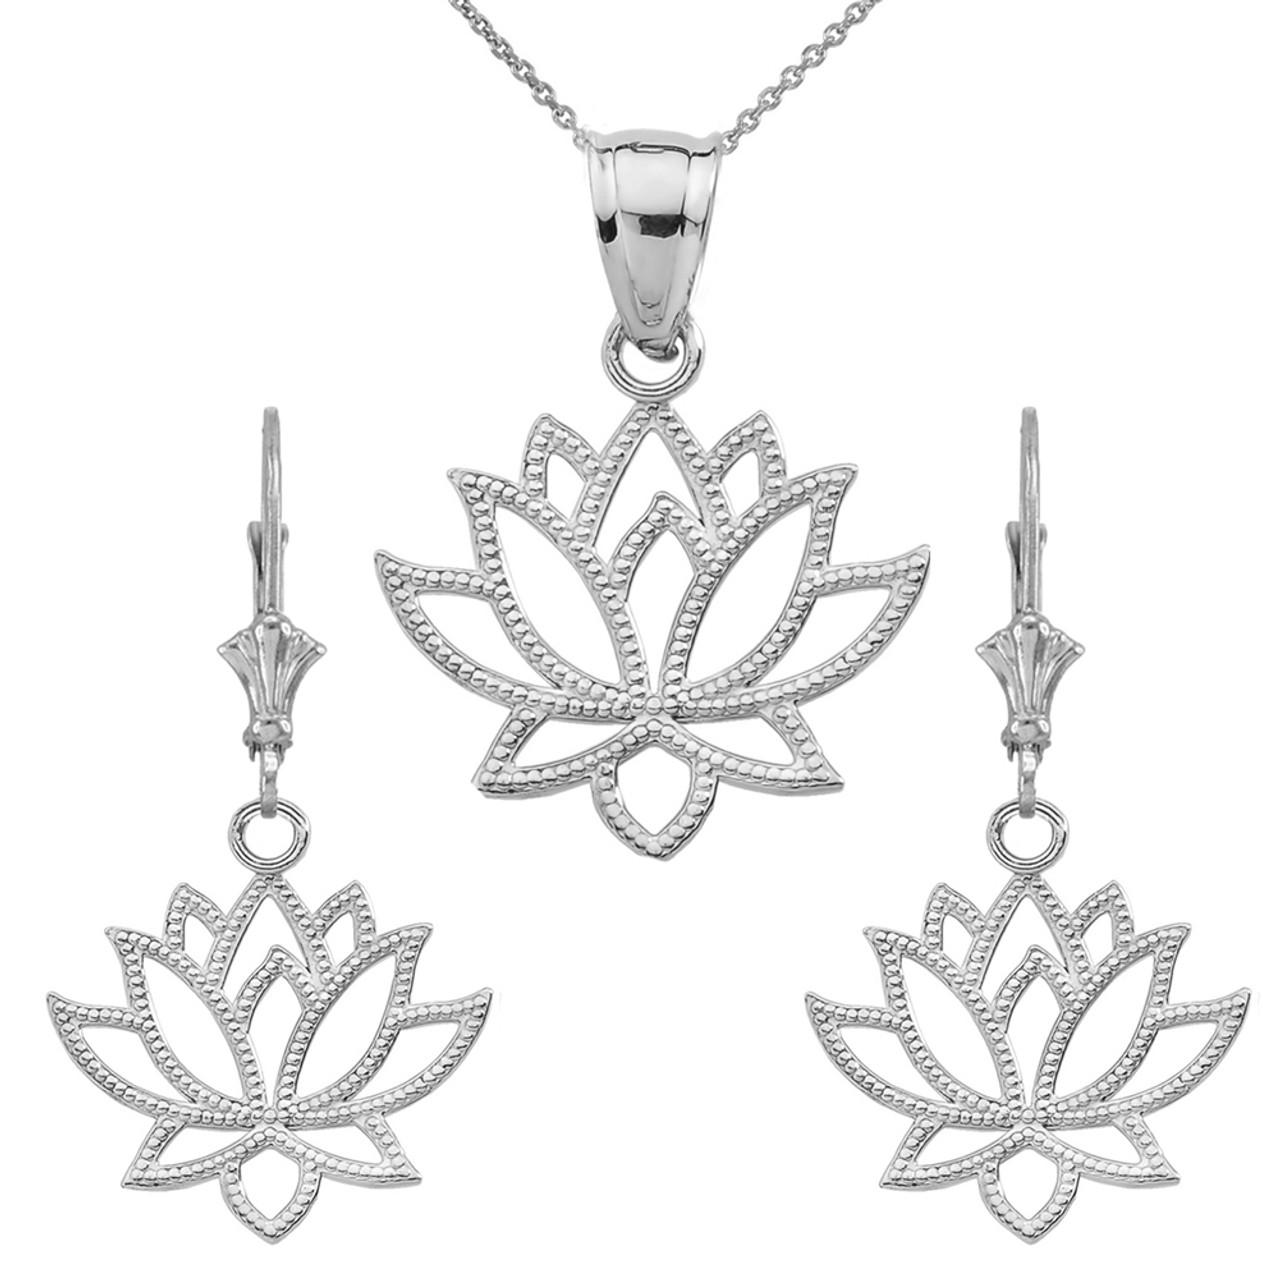 Lotus flower pendant necklace set in sterling silver izmirmasajfo